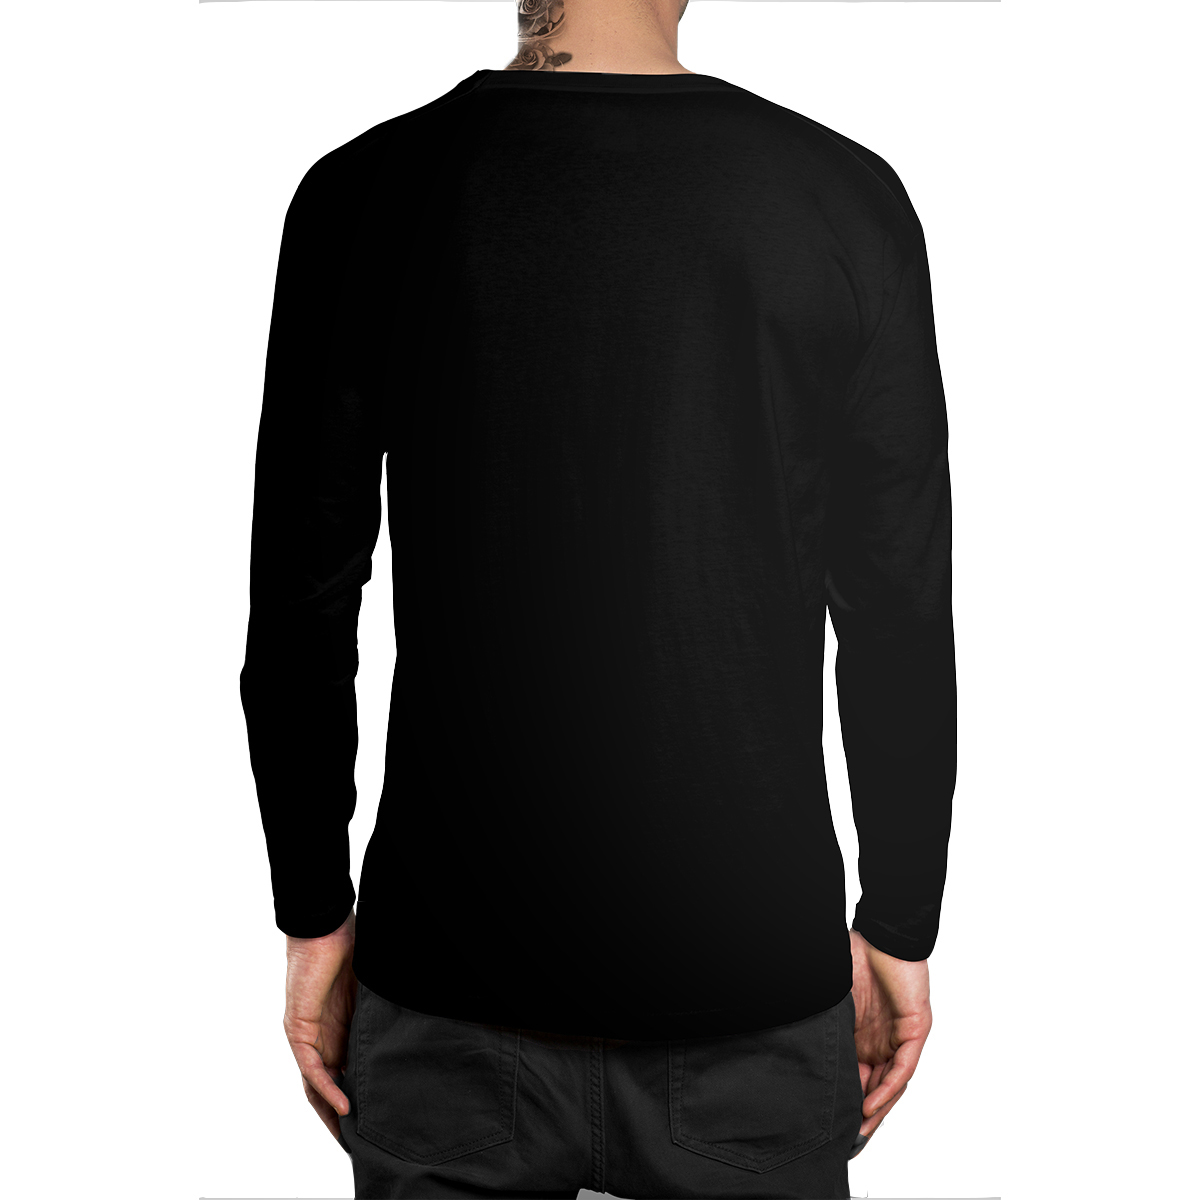 Stompy Camiseta Manga Longa Modelo 35